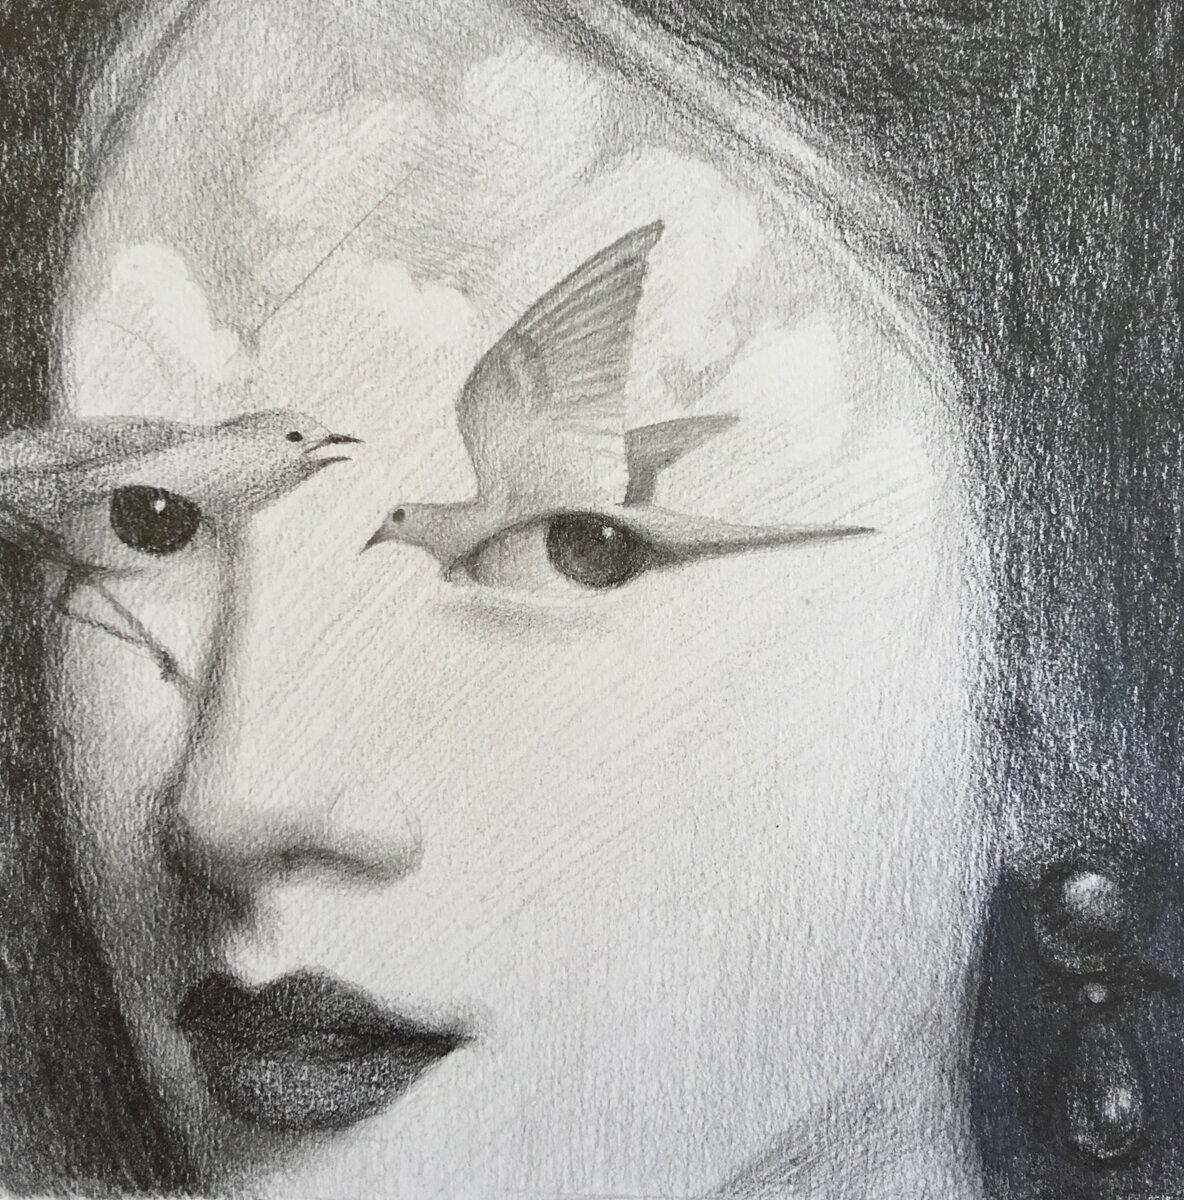 aniela-sobieski-untitled-2019-drawing-e.jpg